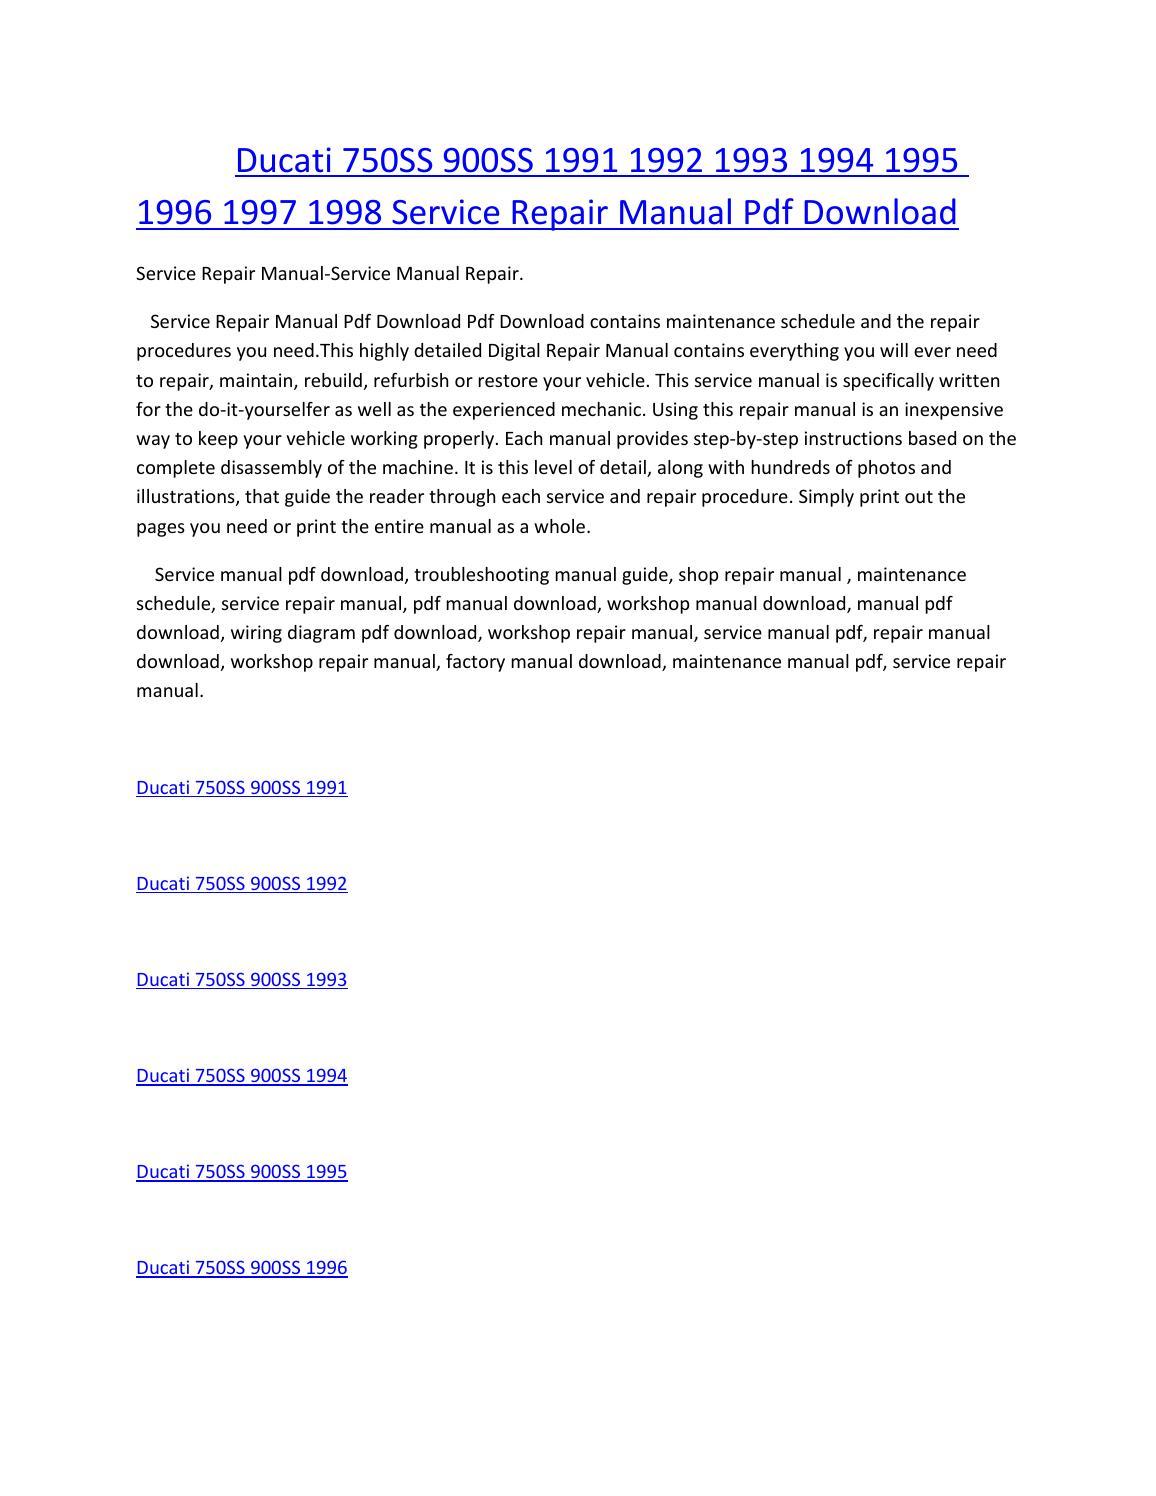 hight resolution of ducati 750ss 900ss 1991 1992 1993 1994 1995 1996 1997 1998 service manual repair pdf download